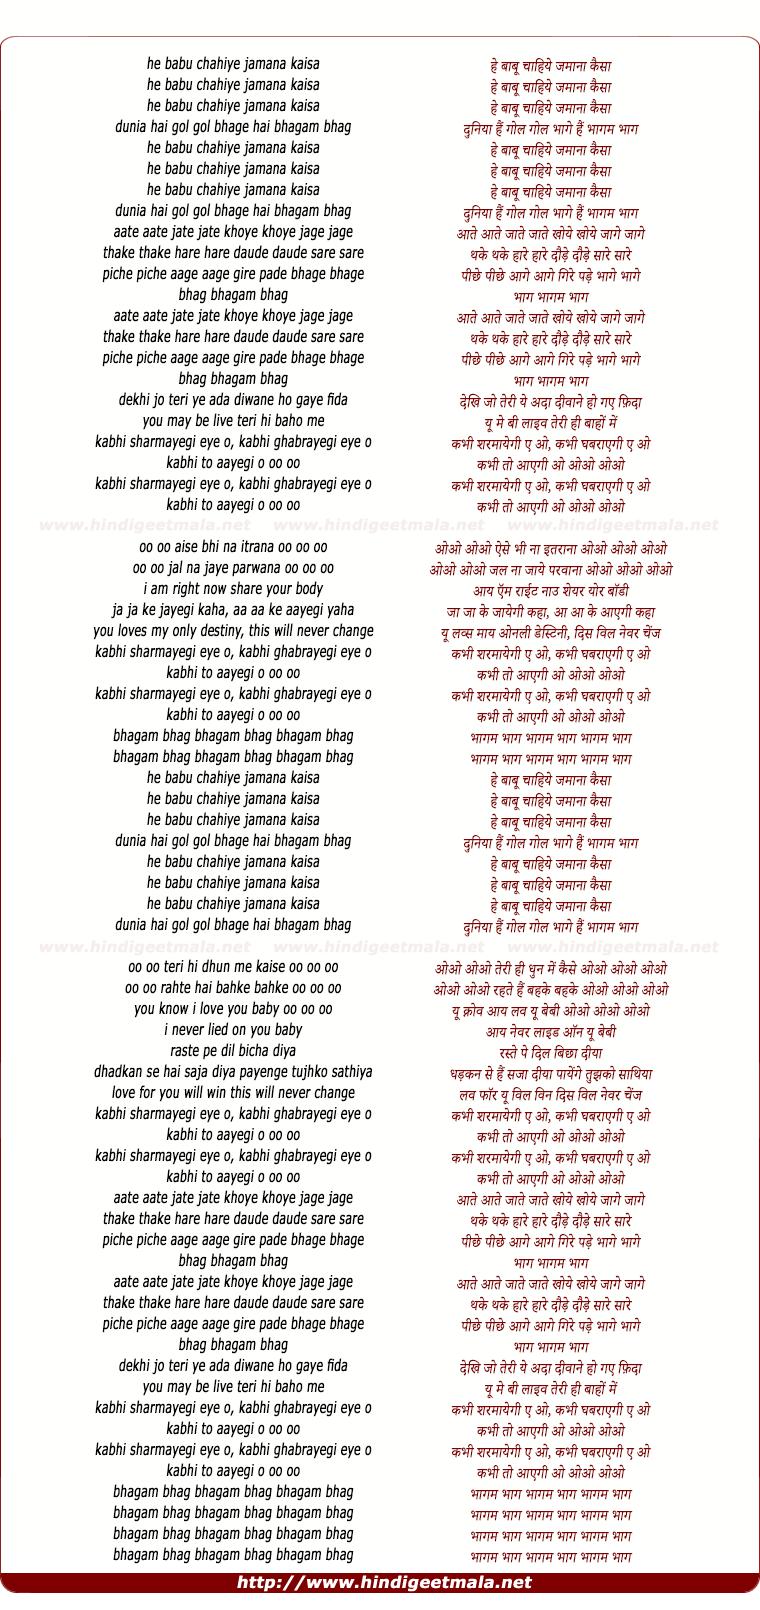 Bhagam Bhaag Song with lyrics.mp4 (akm) - YouTube